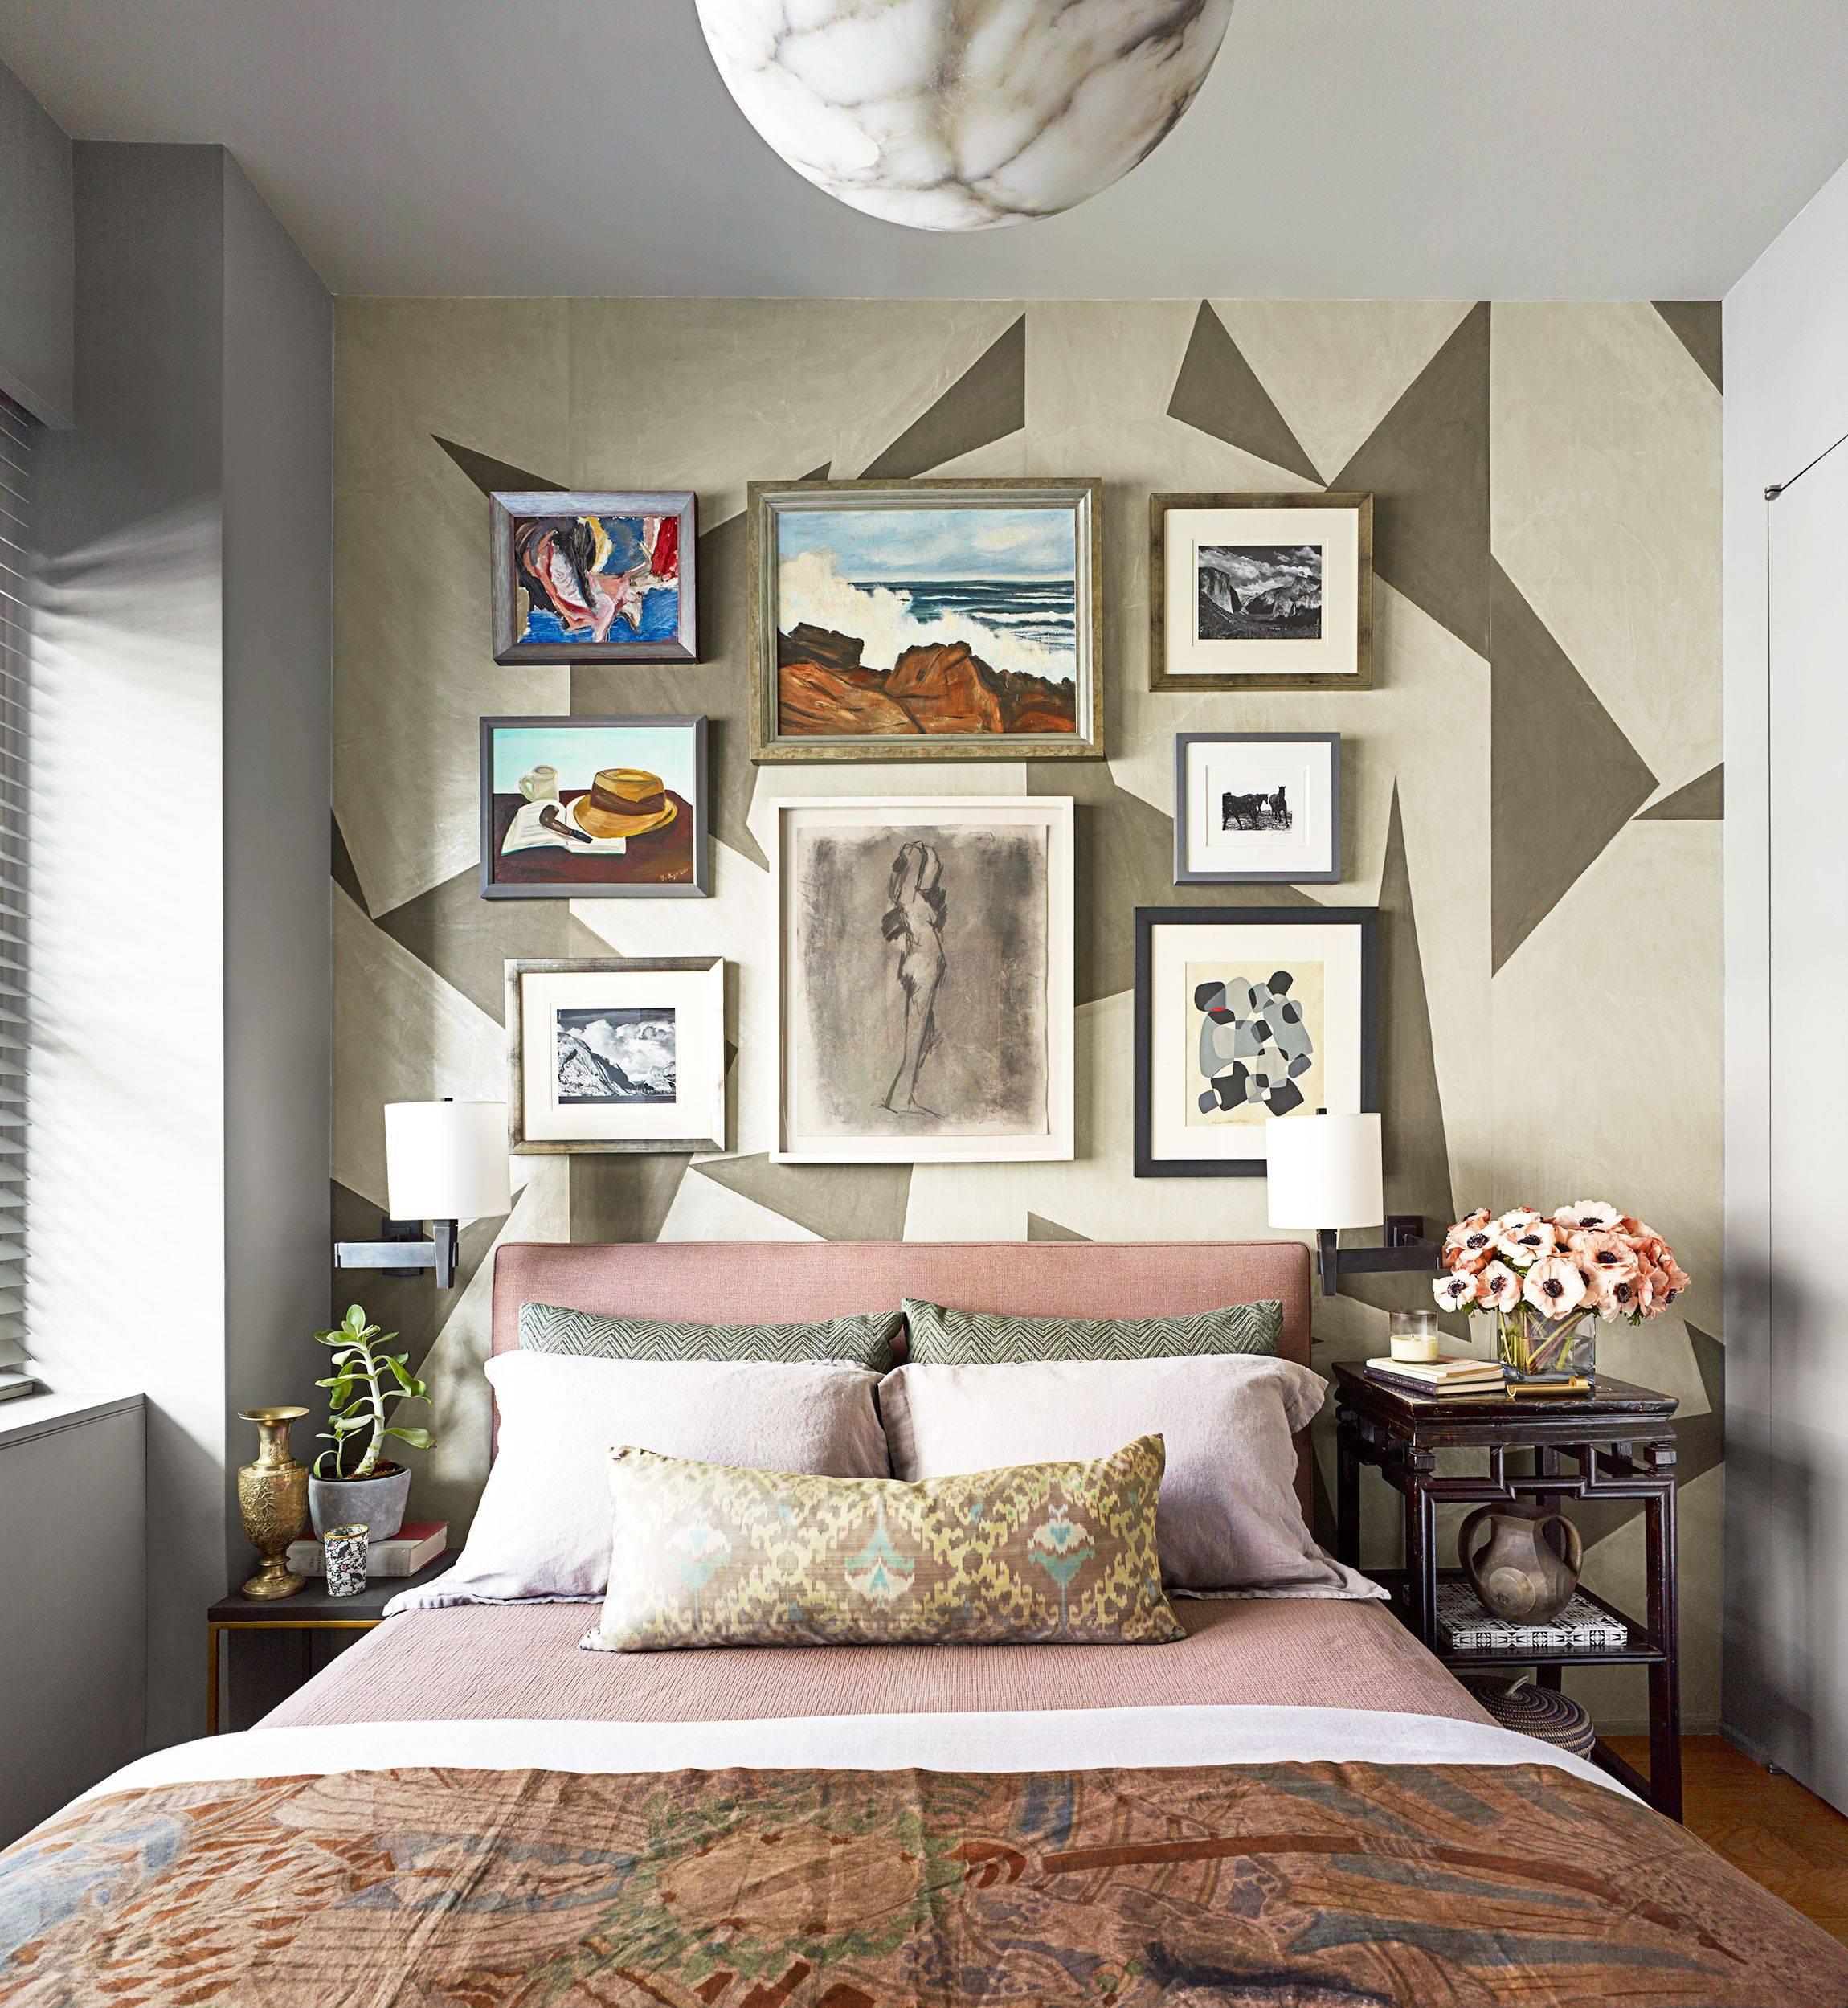 small bedroom ideas hbx greene09